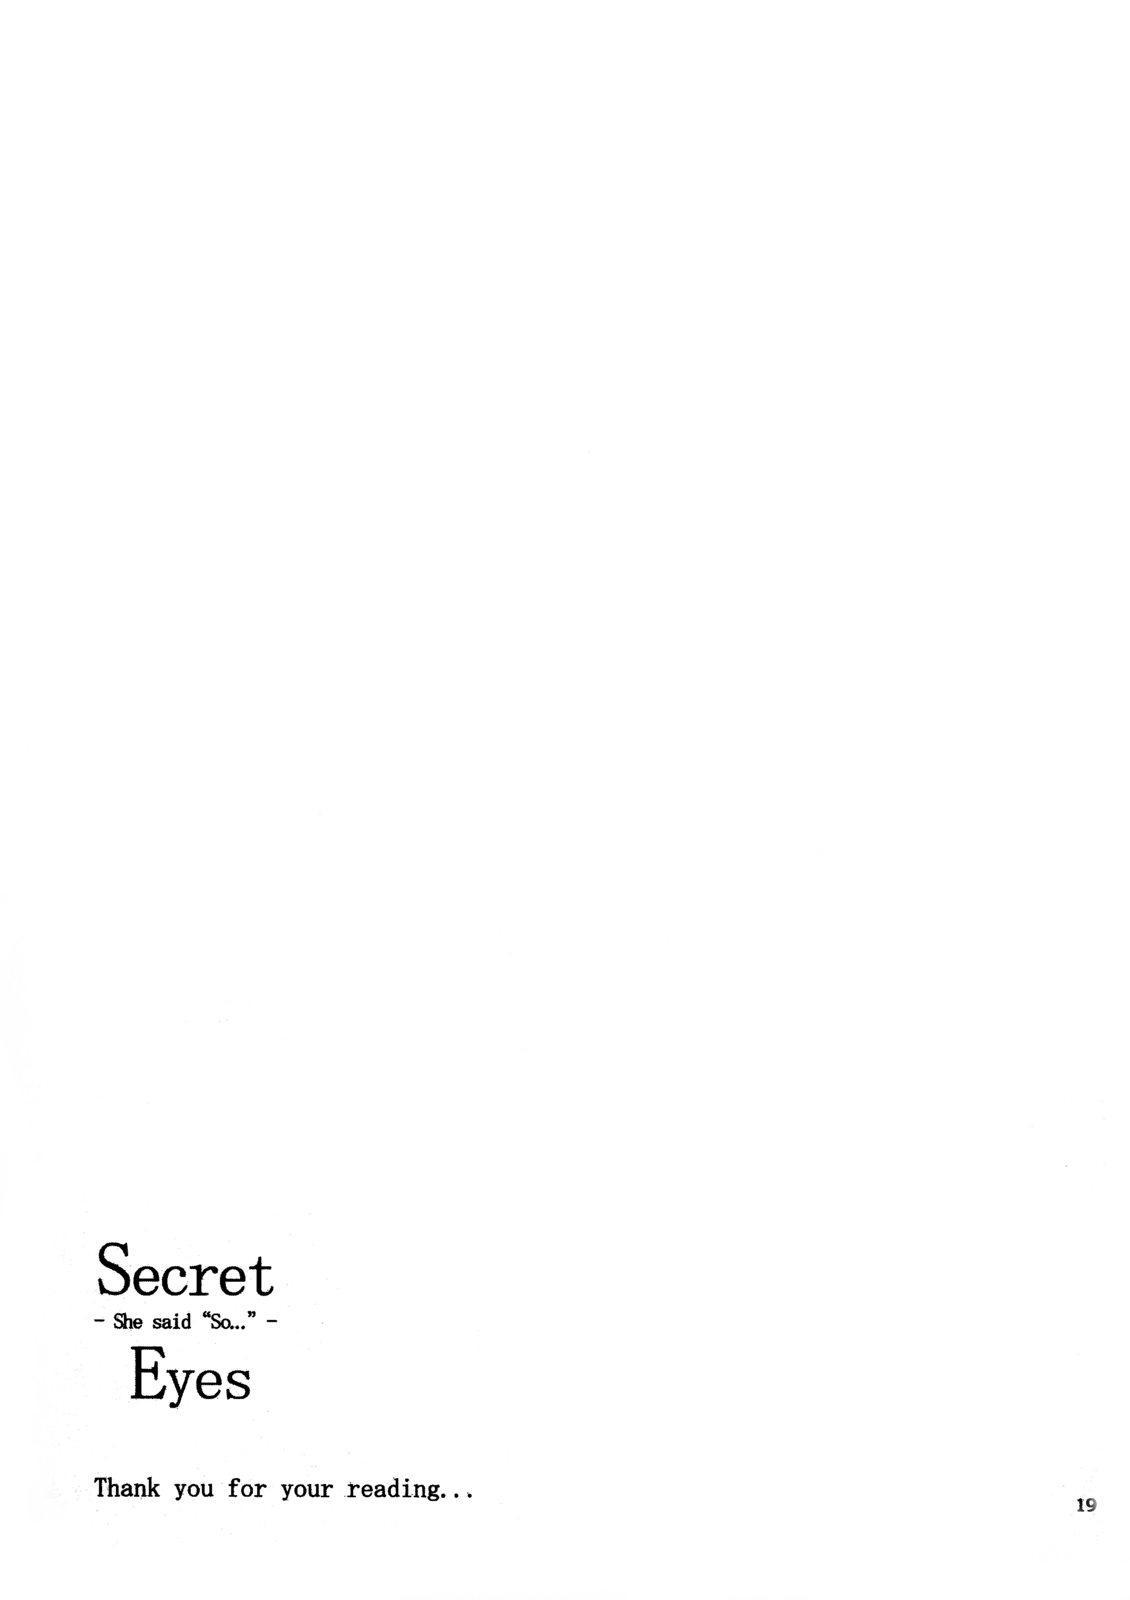 Secret Eyes - She said ''So...'' 18